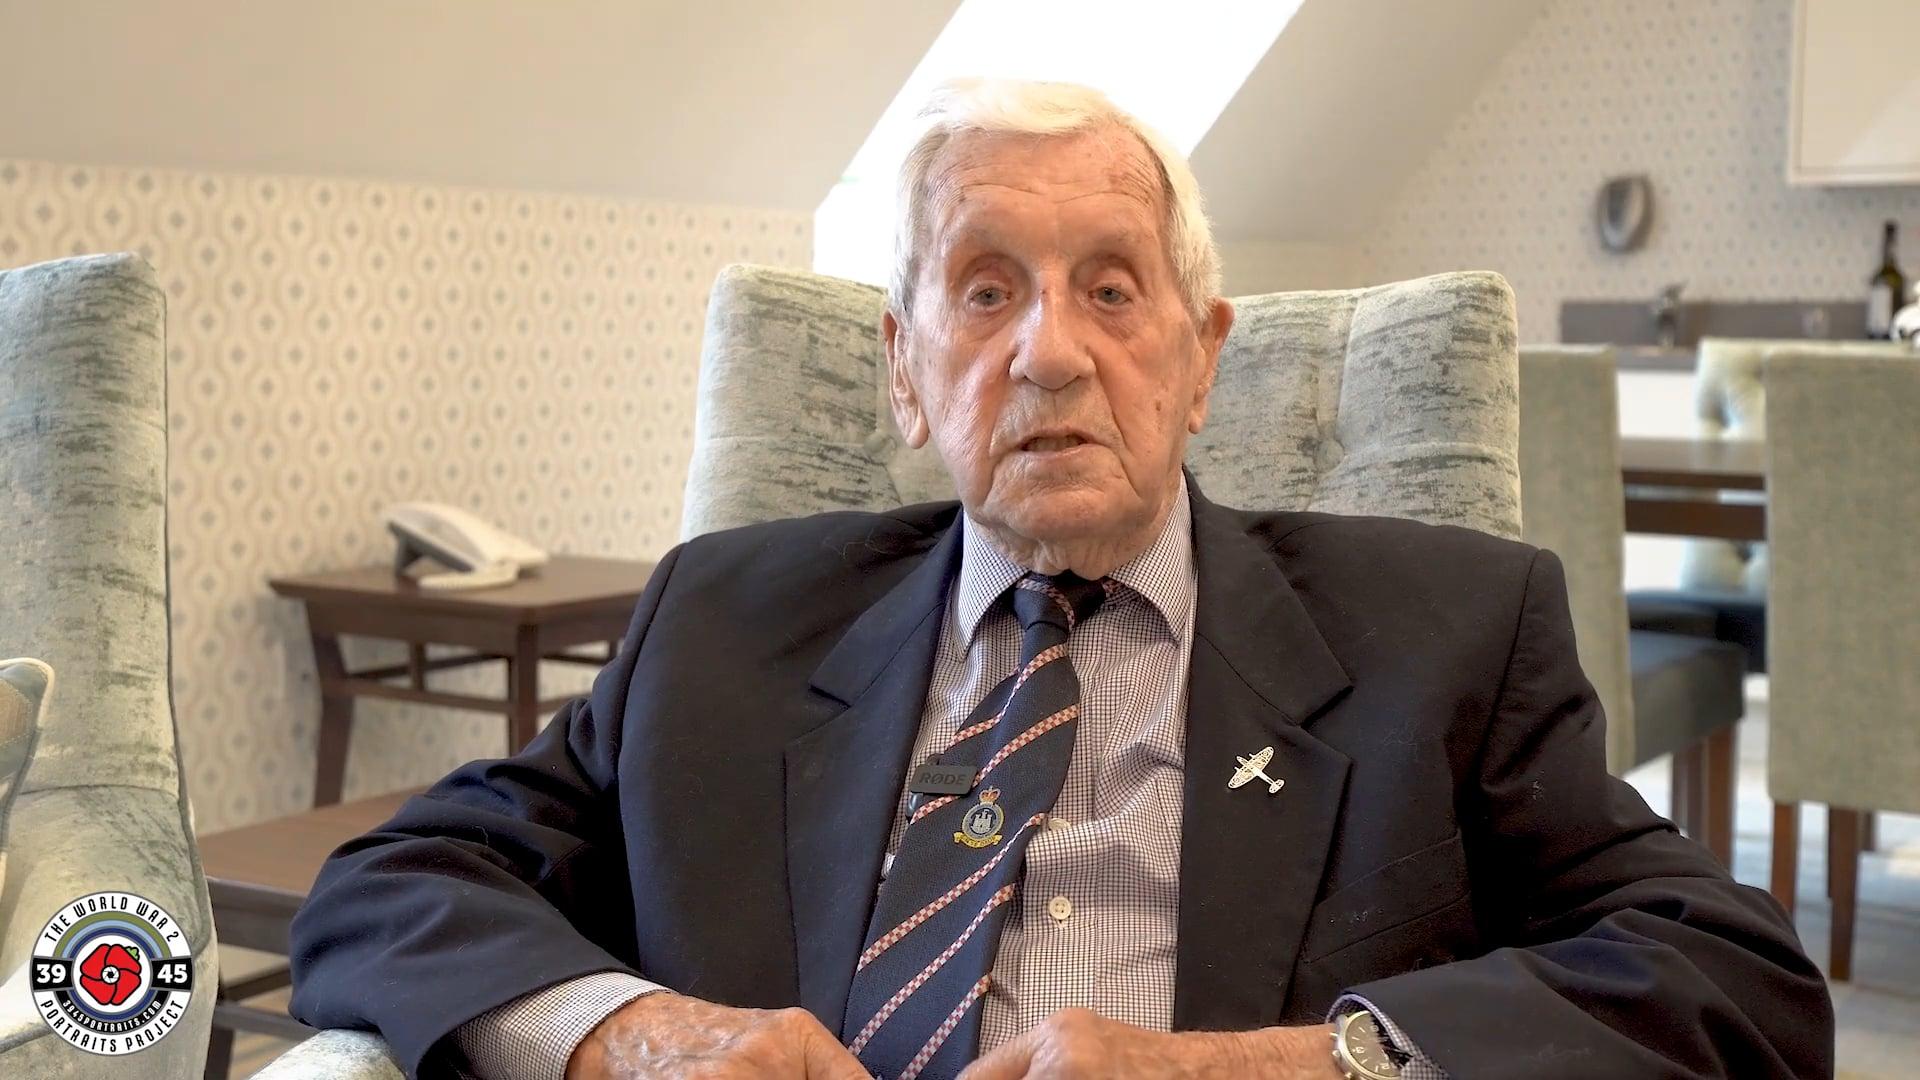 Squadron Leader Allan Scott DFM: The Spitfire was ideal